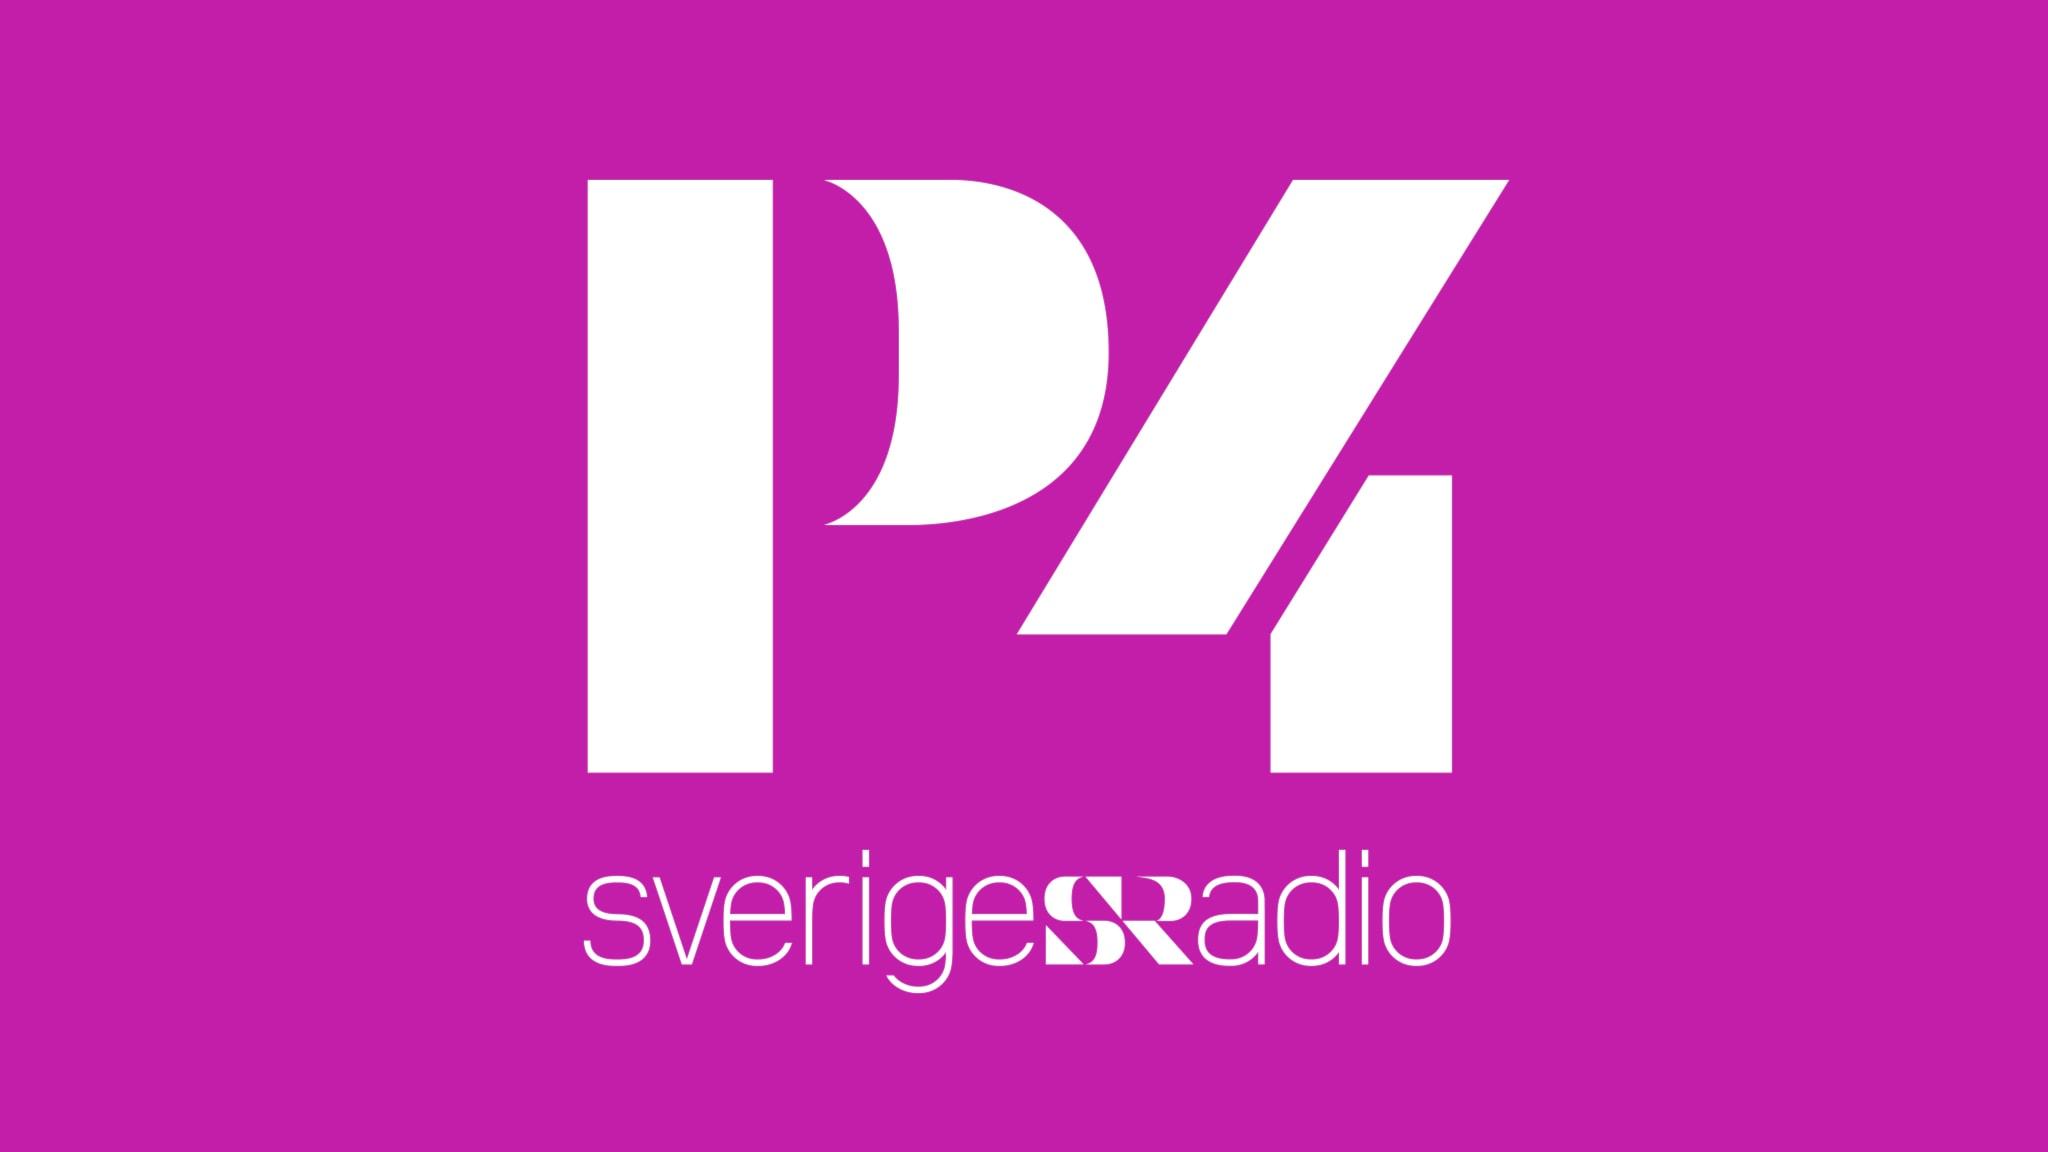 Trafik P4 Stockholm 20180111 09.23 (01.42)